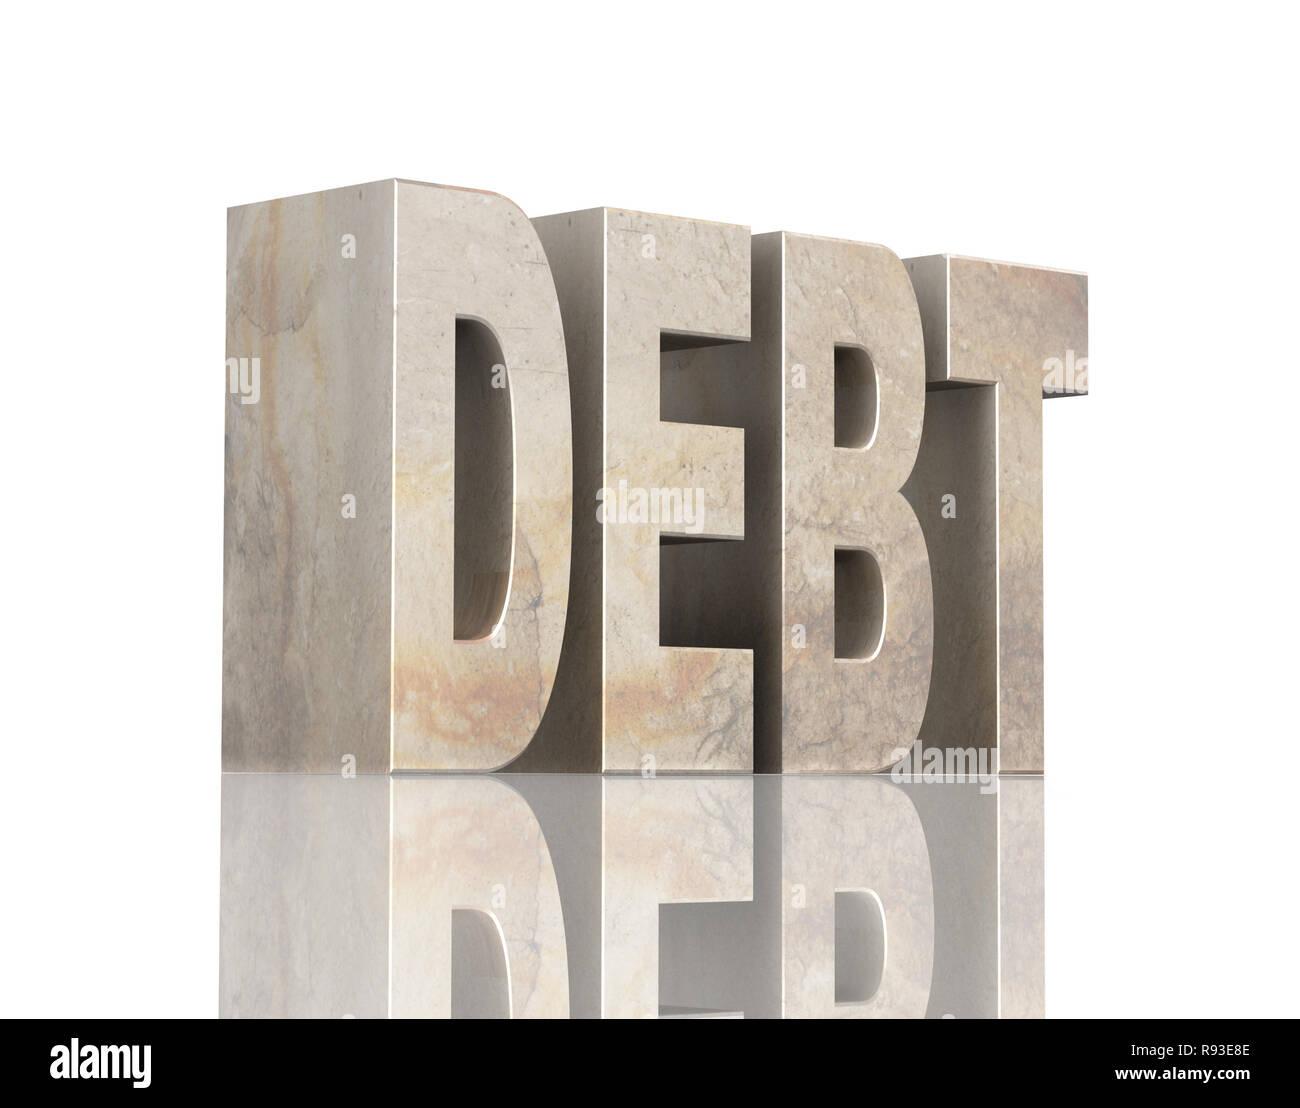 Debt. Stone text - Stock Image